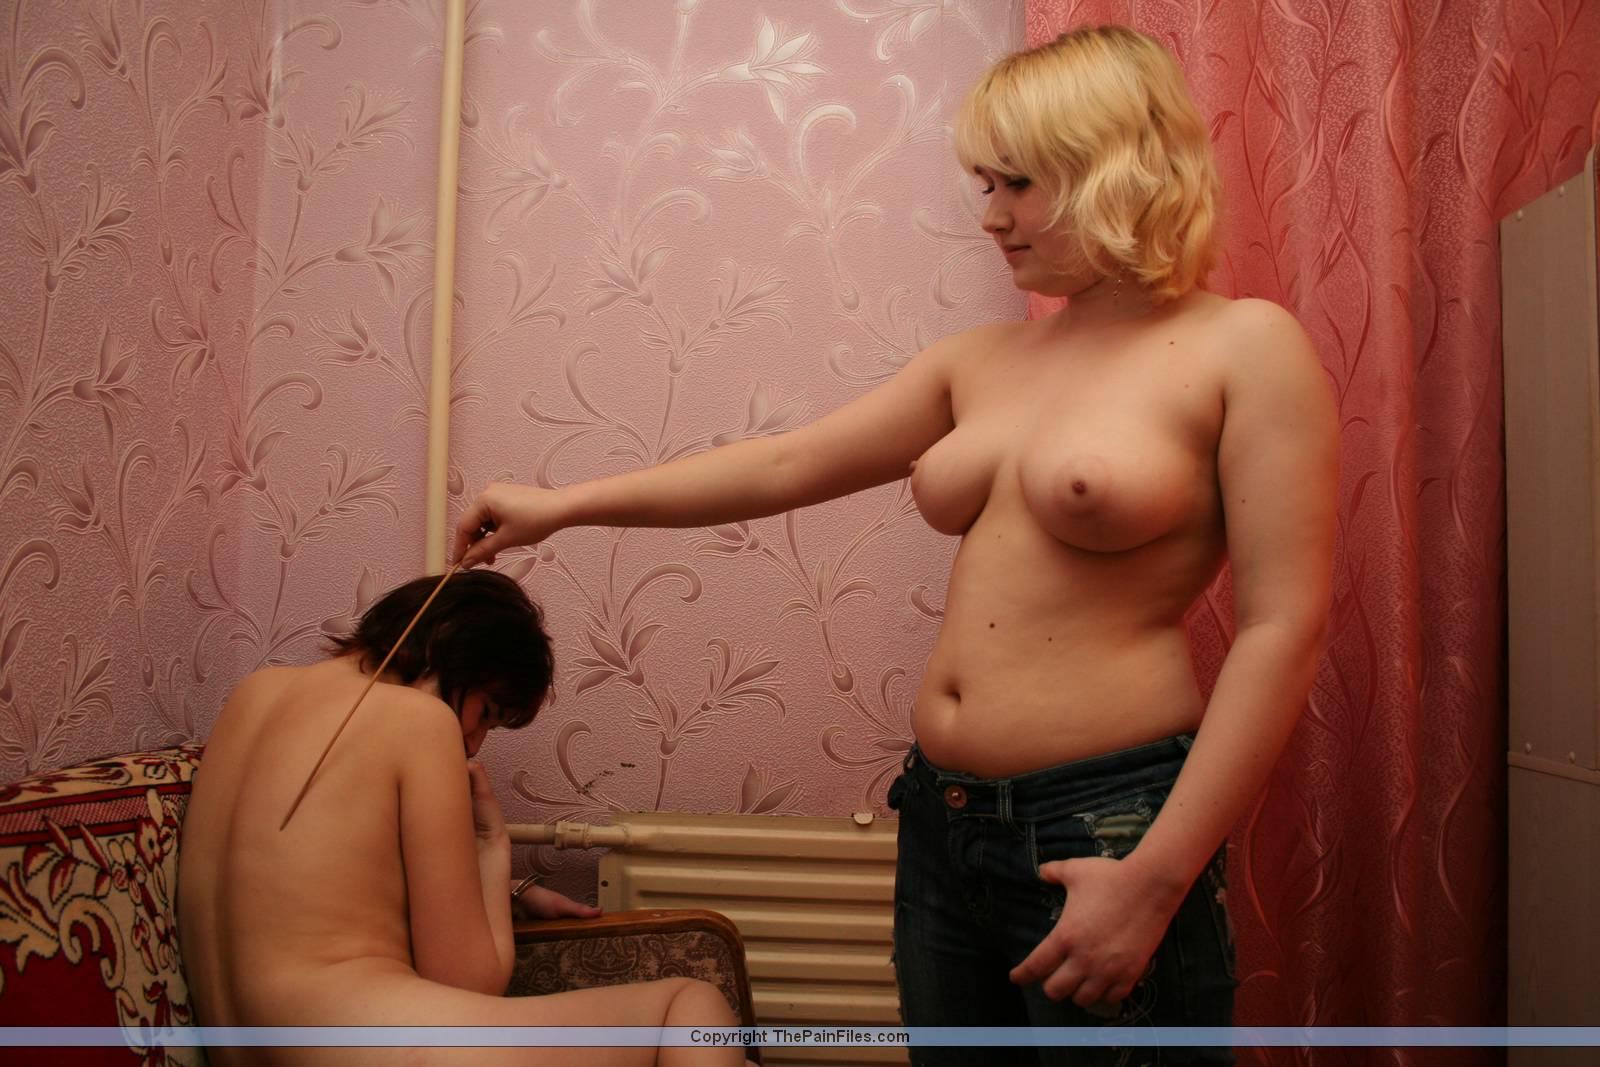 Hard corporal punishment for sophia 10